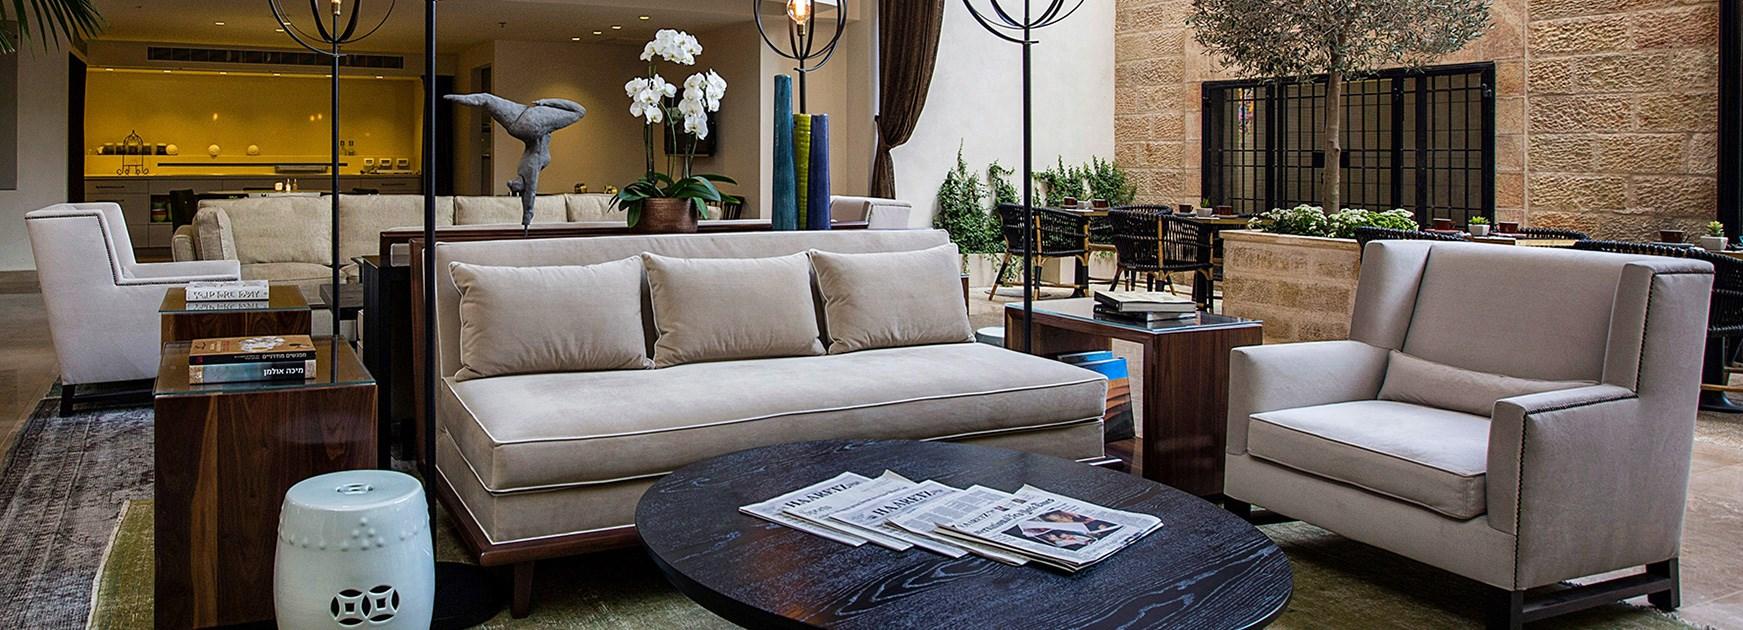 harmony-hotel-jerusalem-header